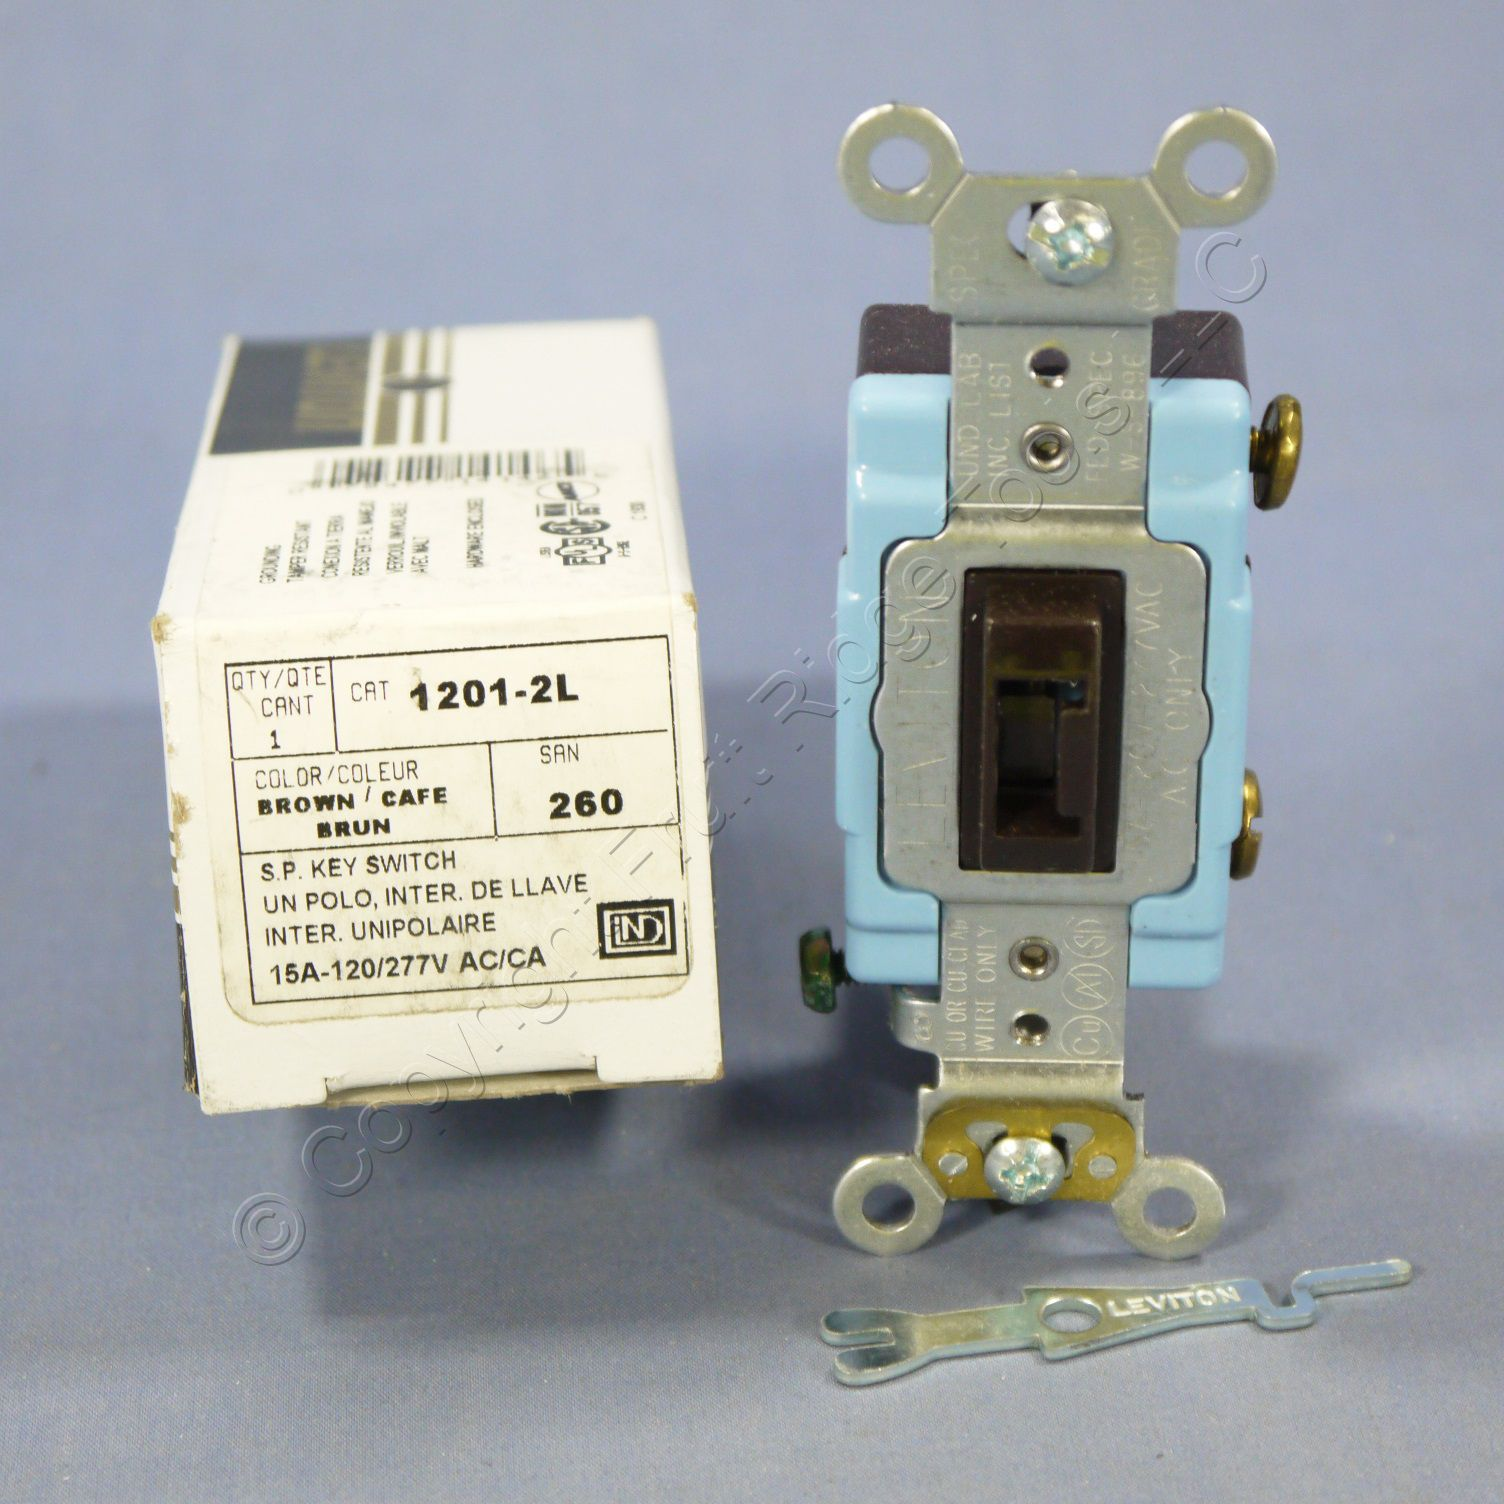 Tamper Proof Light Switch Key: New Leviton Brown INDUSTRIAL Locking Keyed Light Switch Tamper Resistant  1201-2L - Fruit Ridge Tools, LLC,Lighting